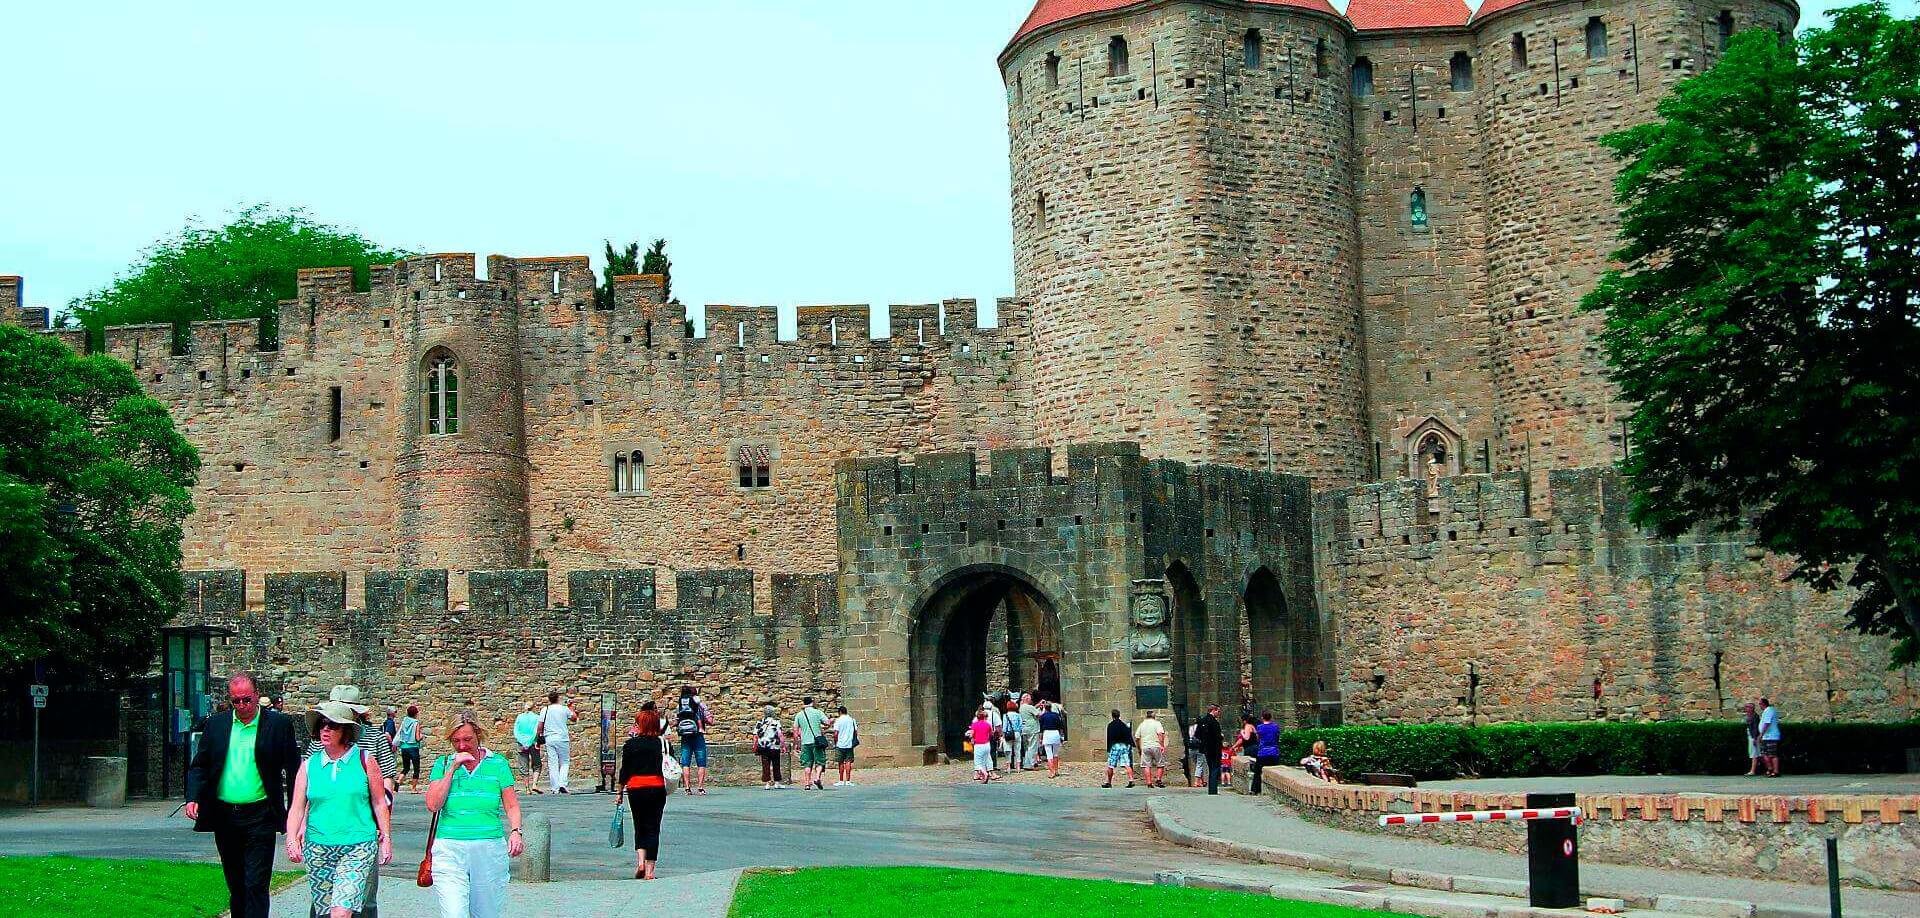 Sant Feliu de Guixols - Carcassonne (France)